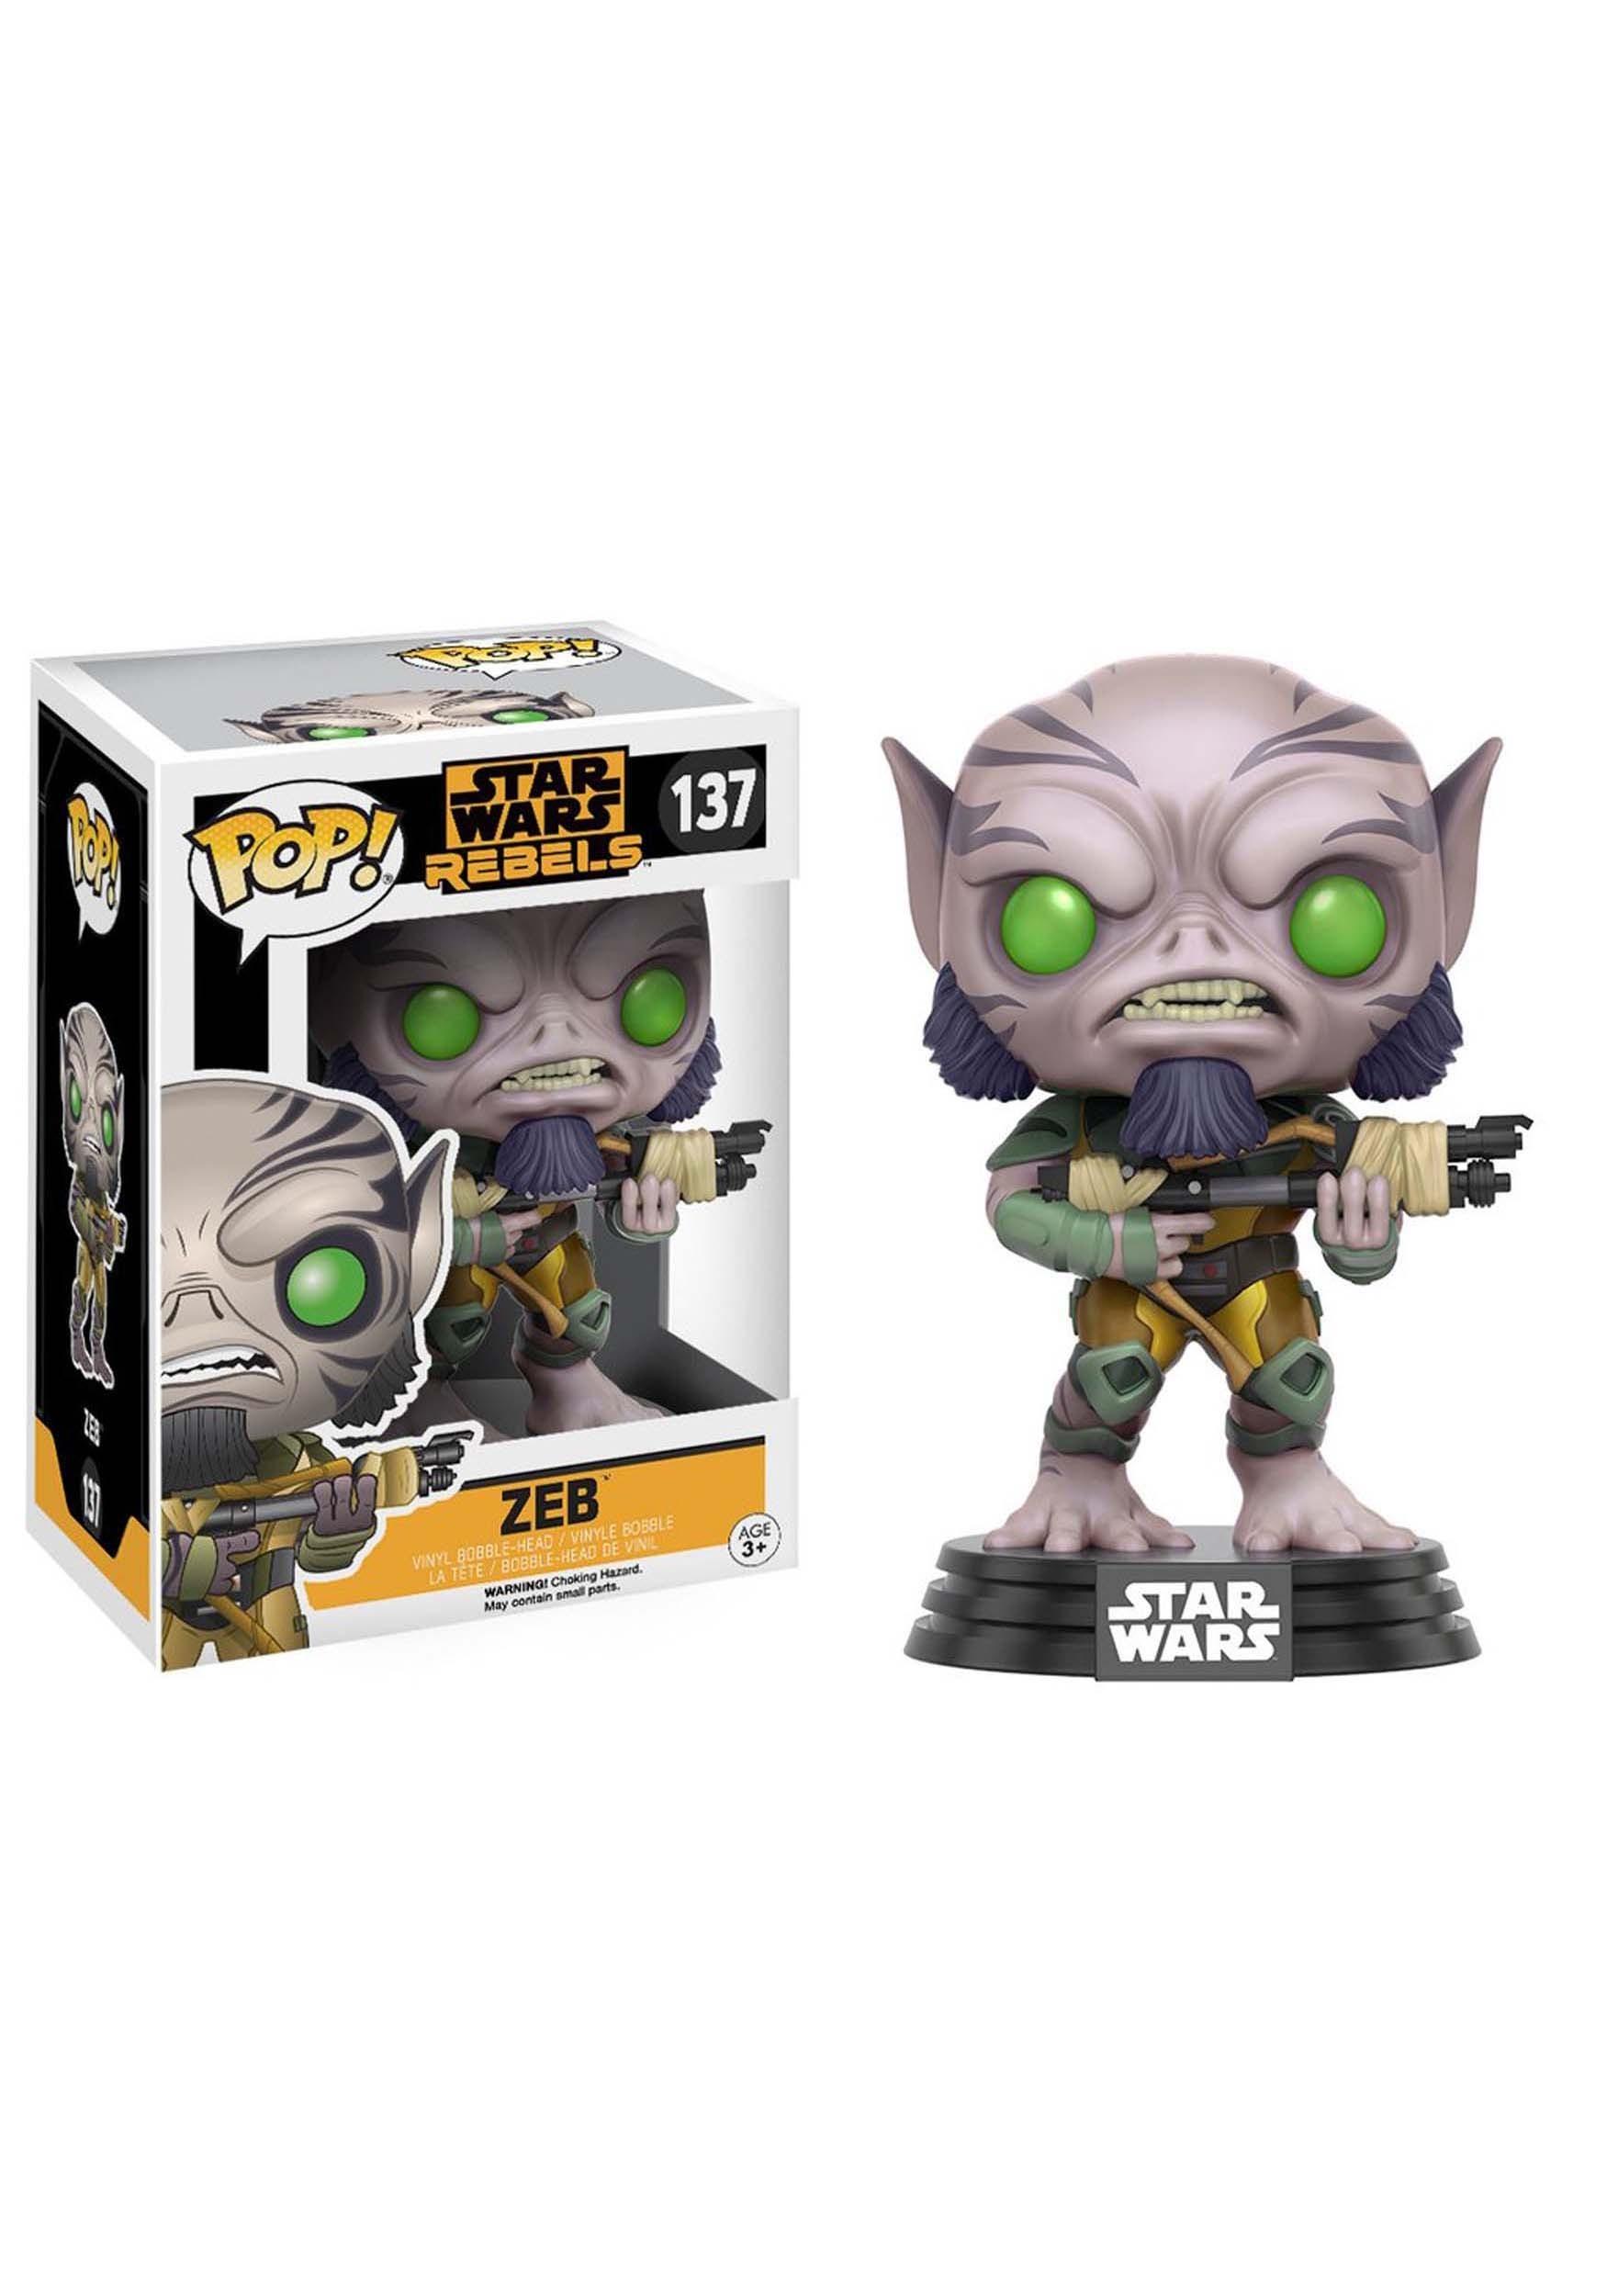 POP Star Wars: Rebels - Zeb Bobblehead Figure FN10775